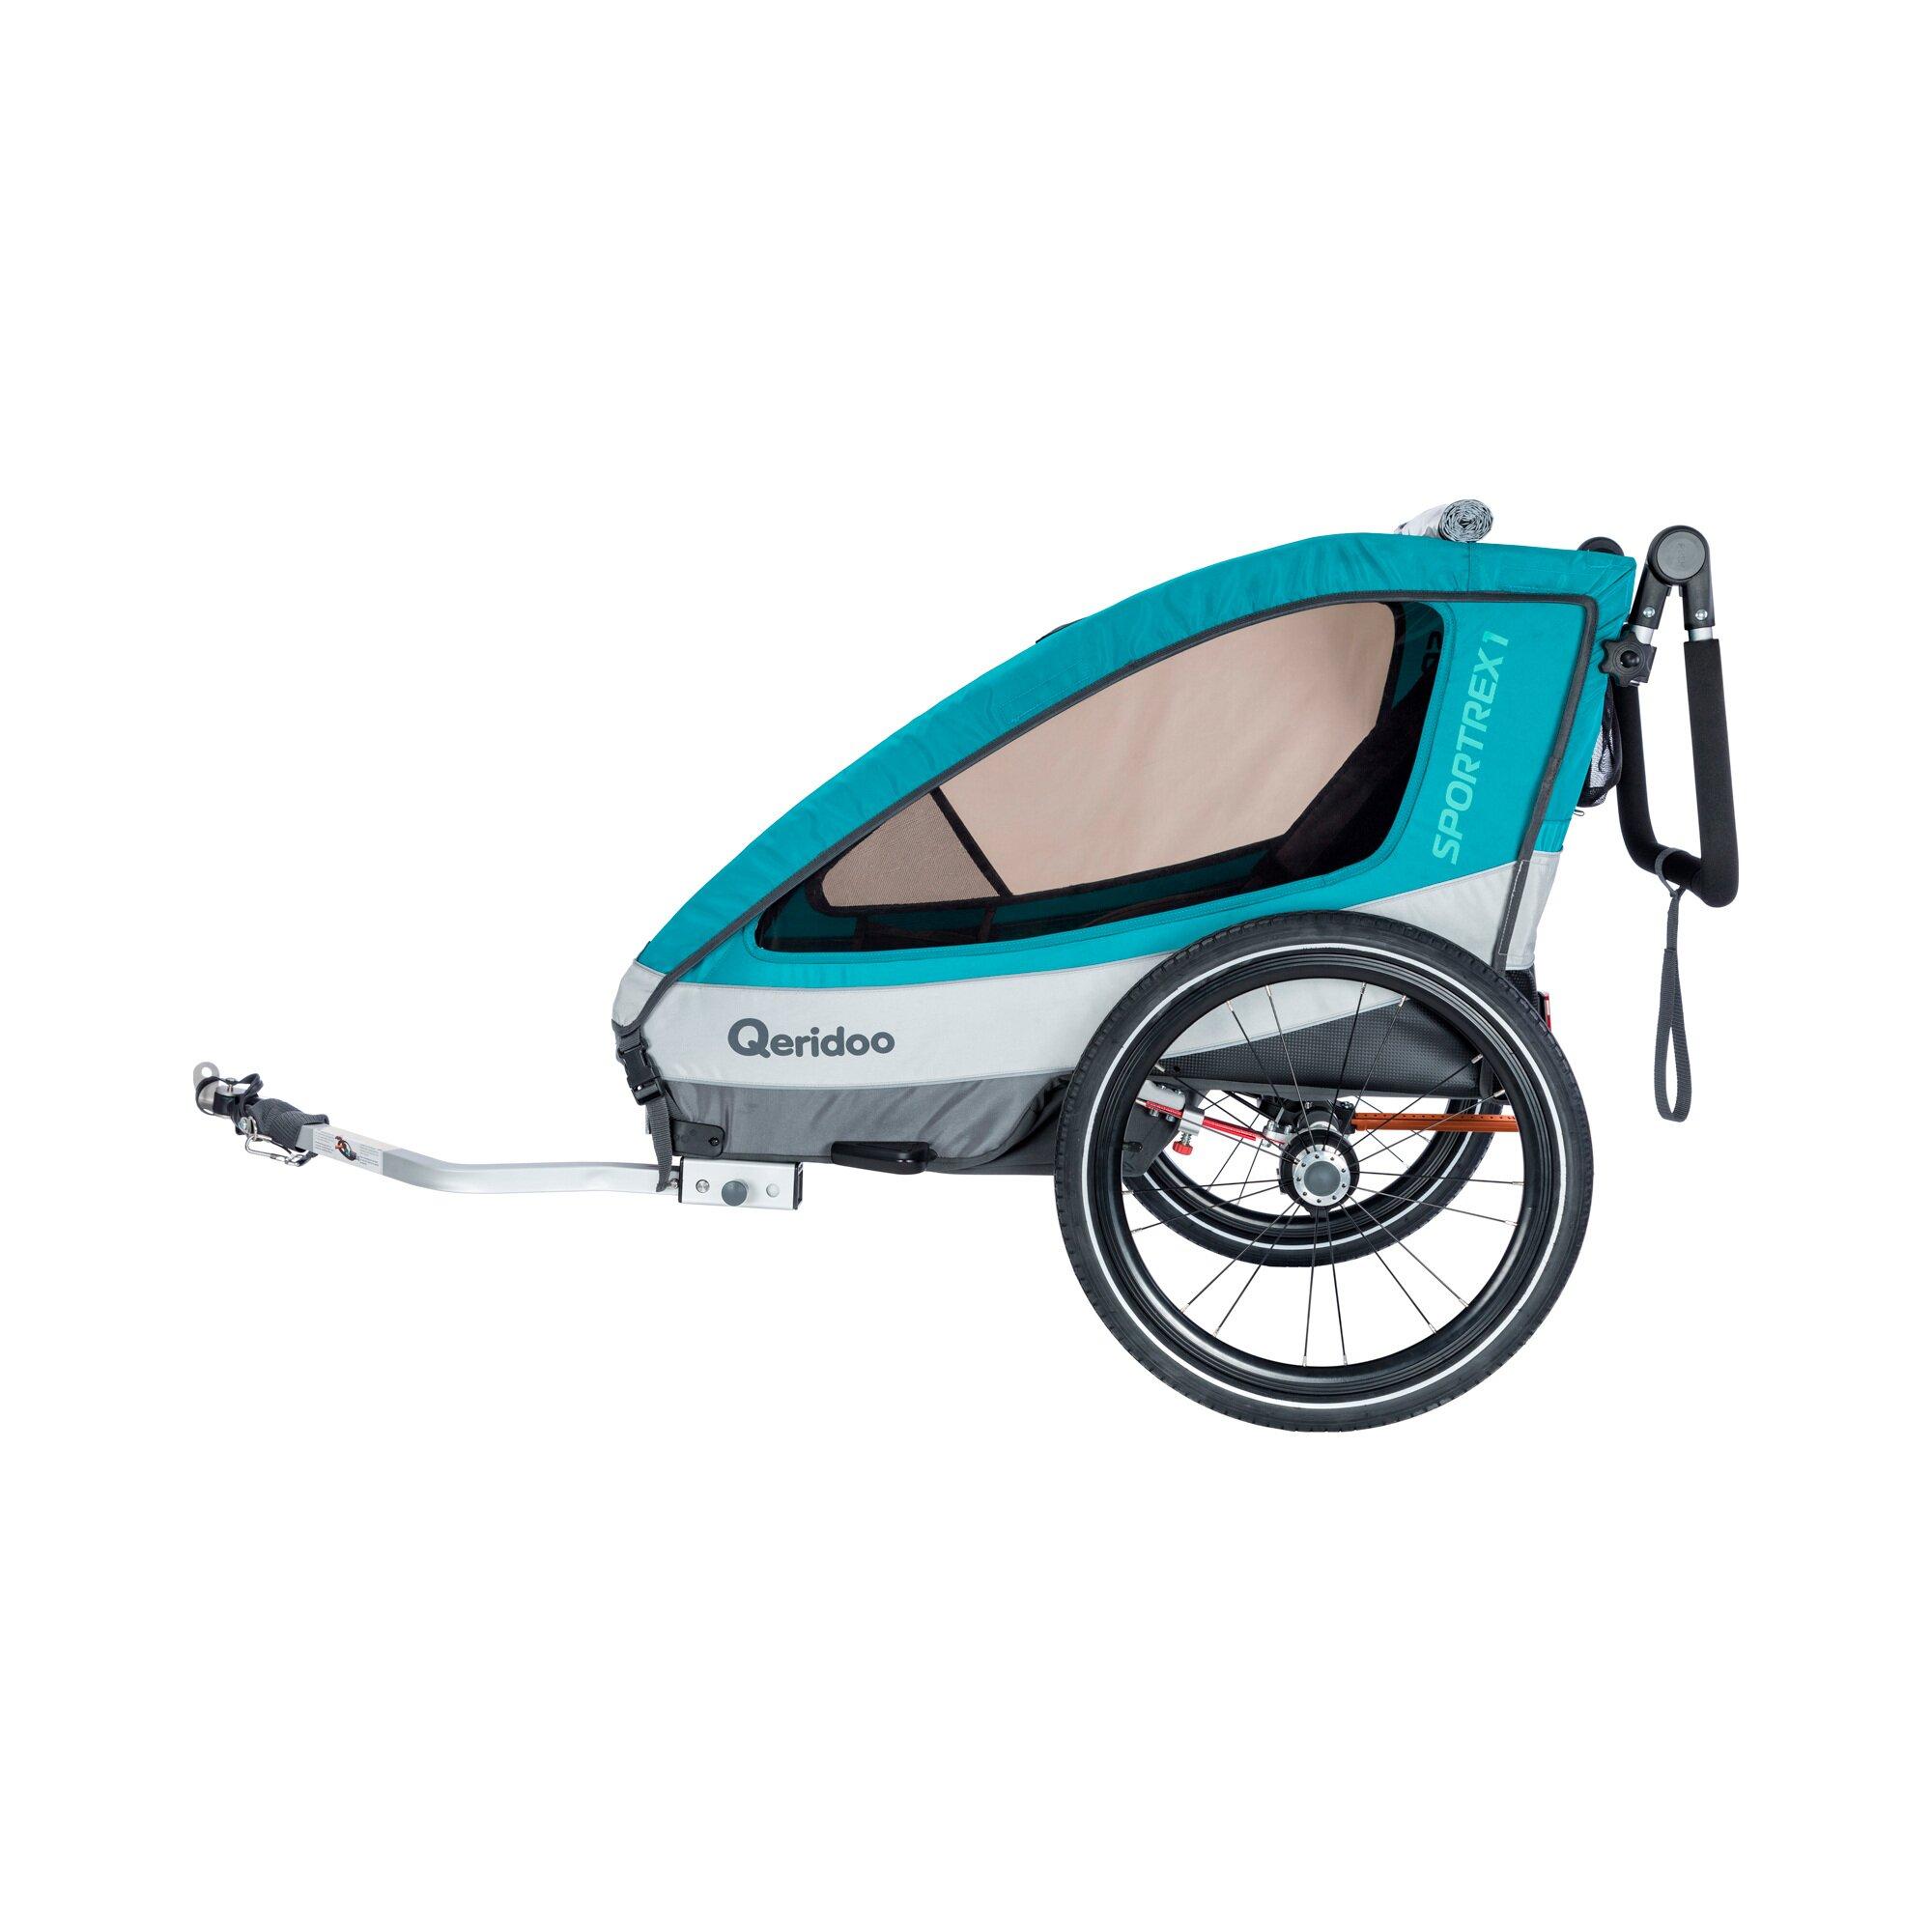 qeridoo-fahrradanhanger-sportrex1-design-2018-blau